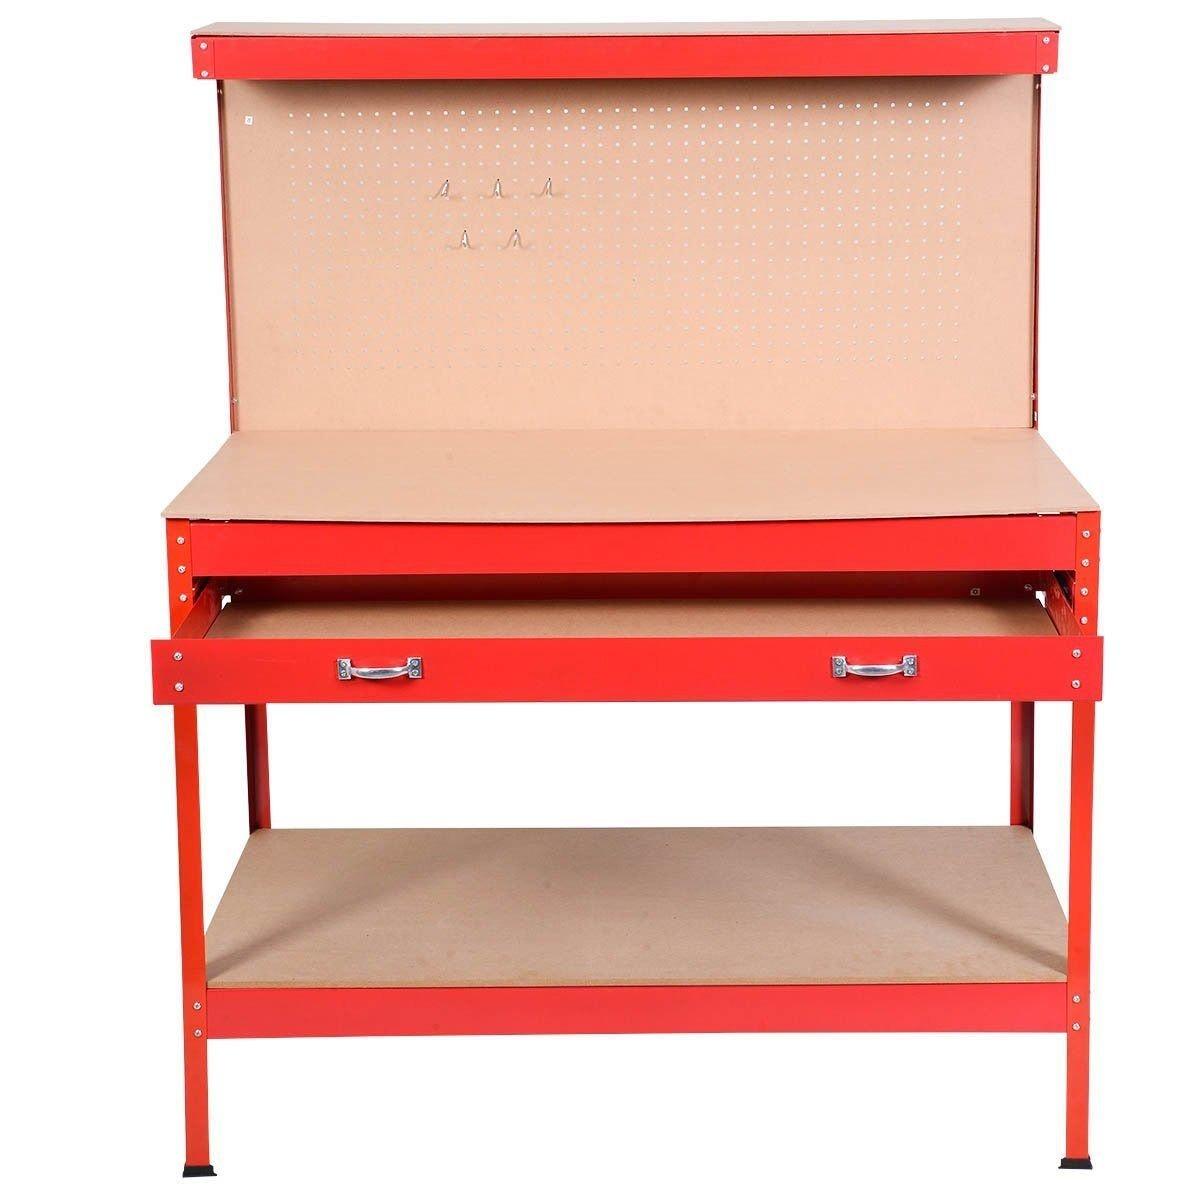 Red Work Bench Tool Storage Steel Tool Workshop Table W/ Drawer / Peg Board